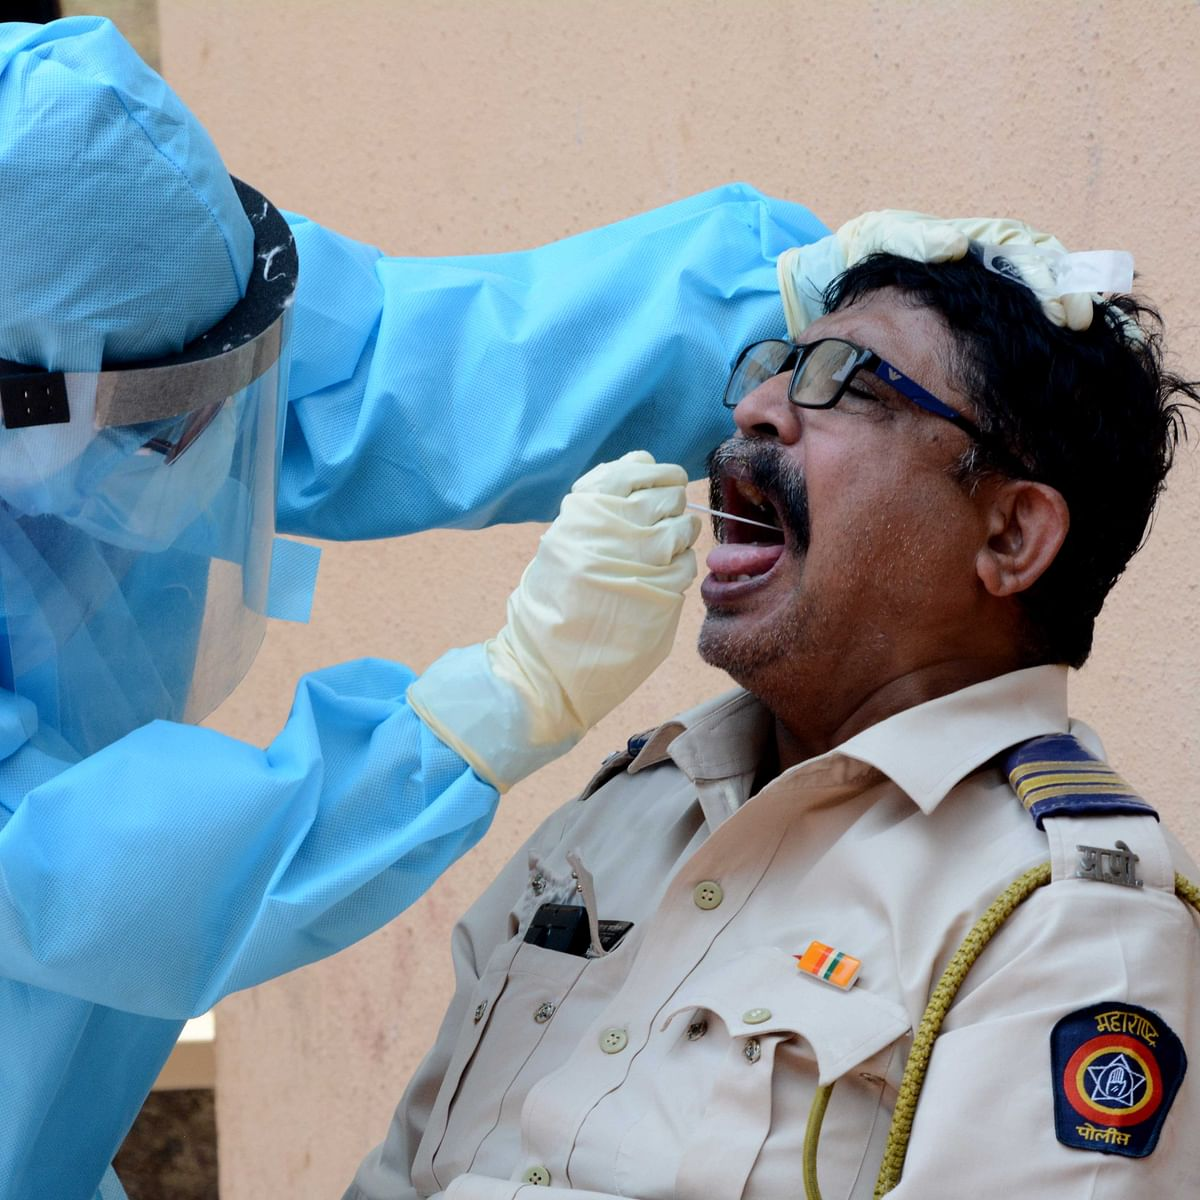 15,591 new coronavirus cases in Maha, 424 deaths